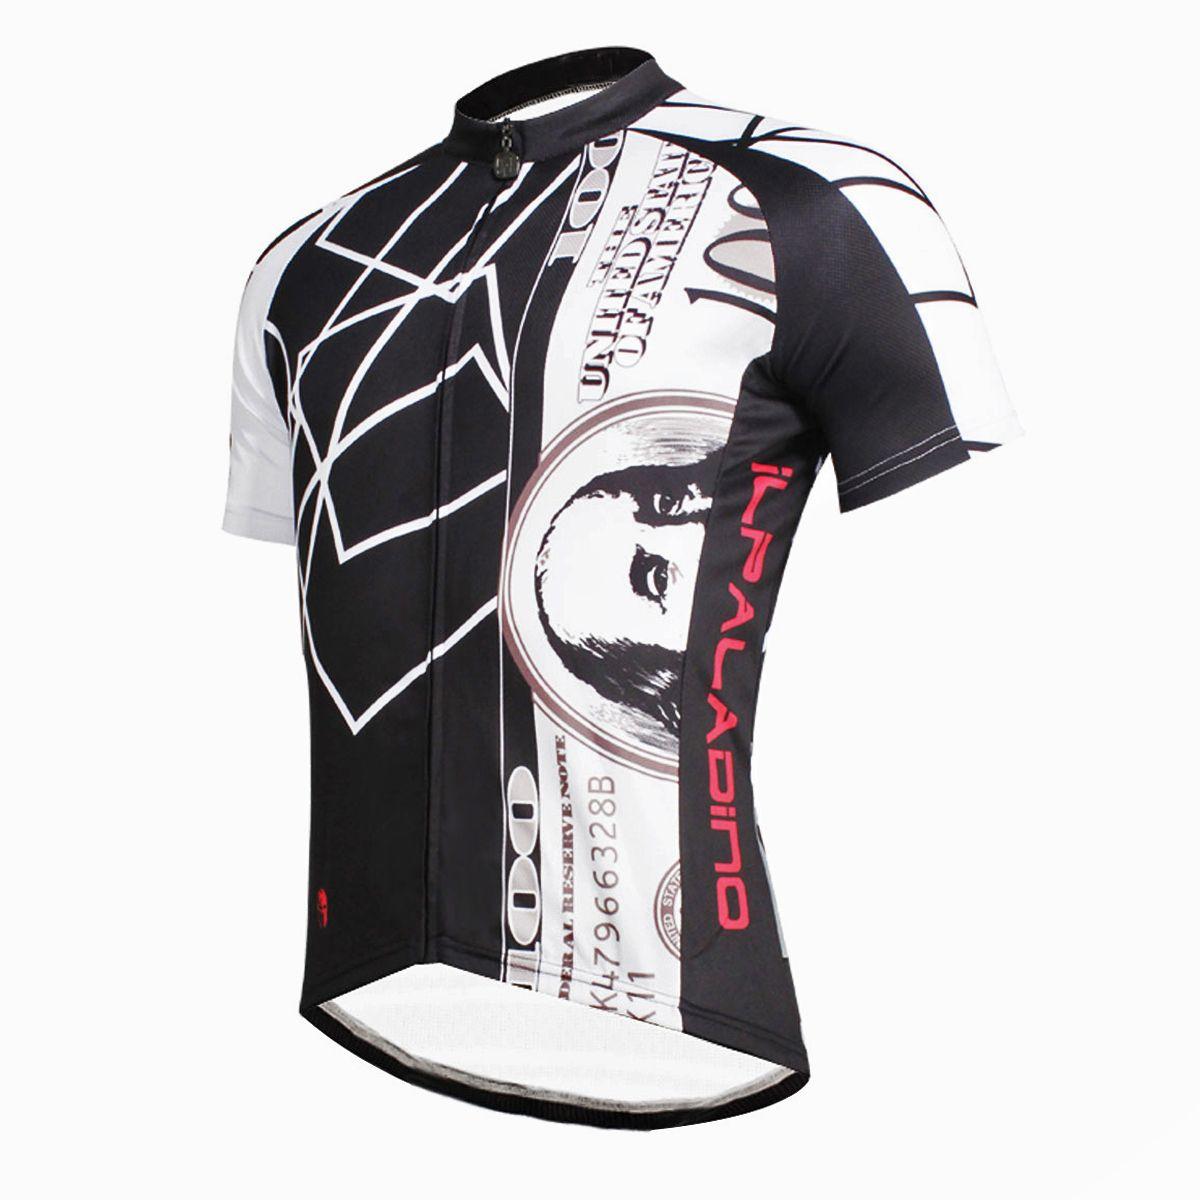 unique cycling jerseys,Men Cycling Jerseys,cycling jerseys